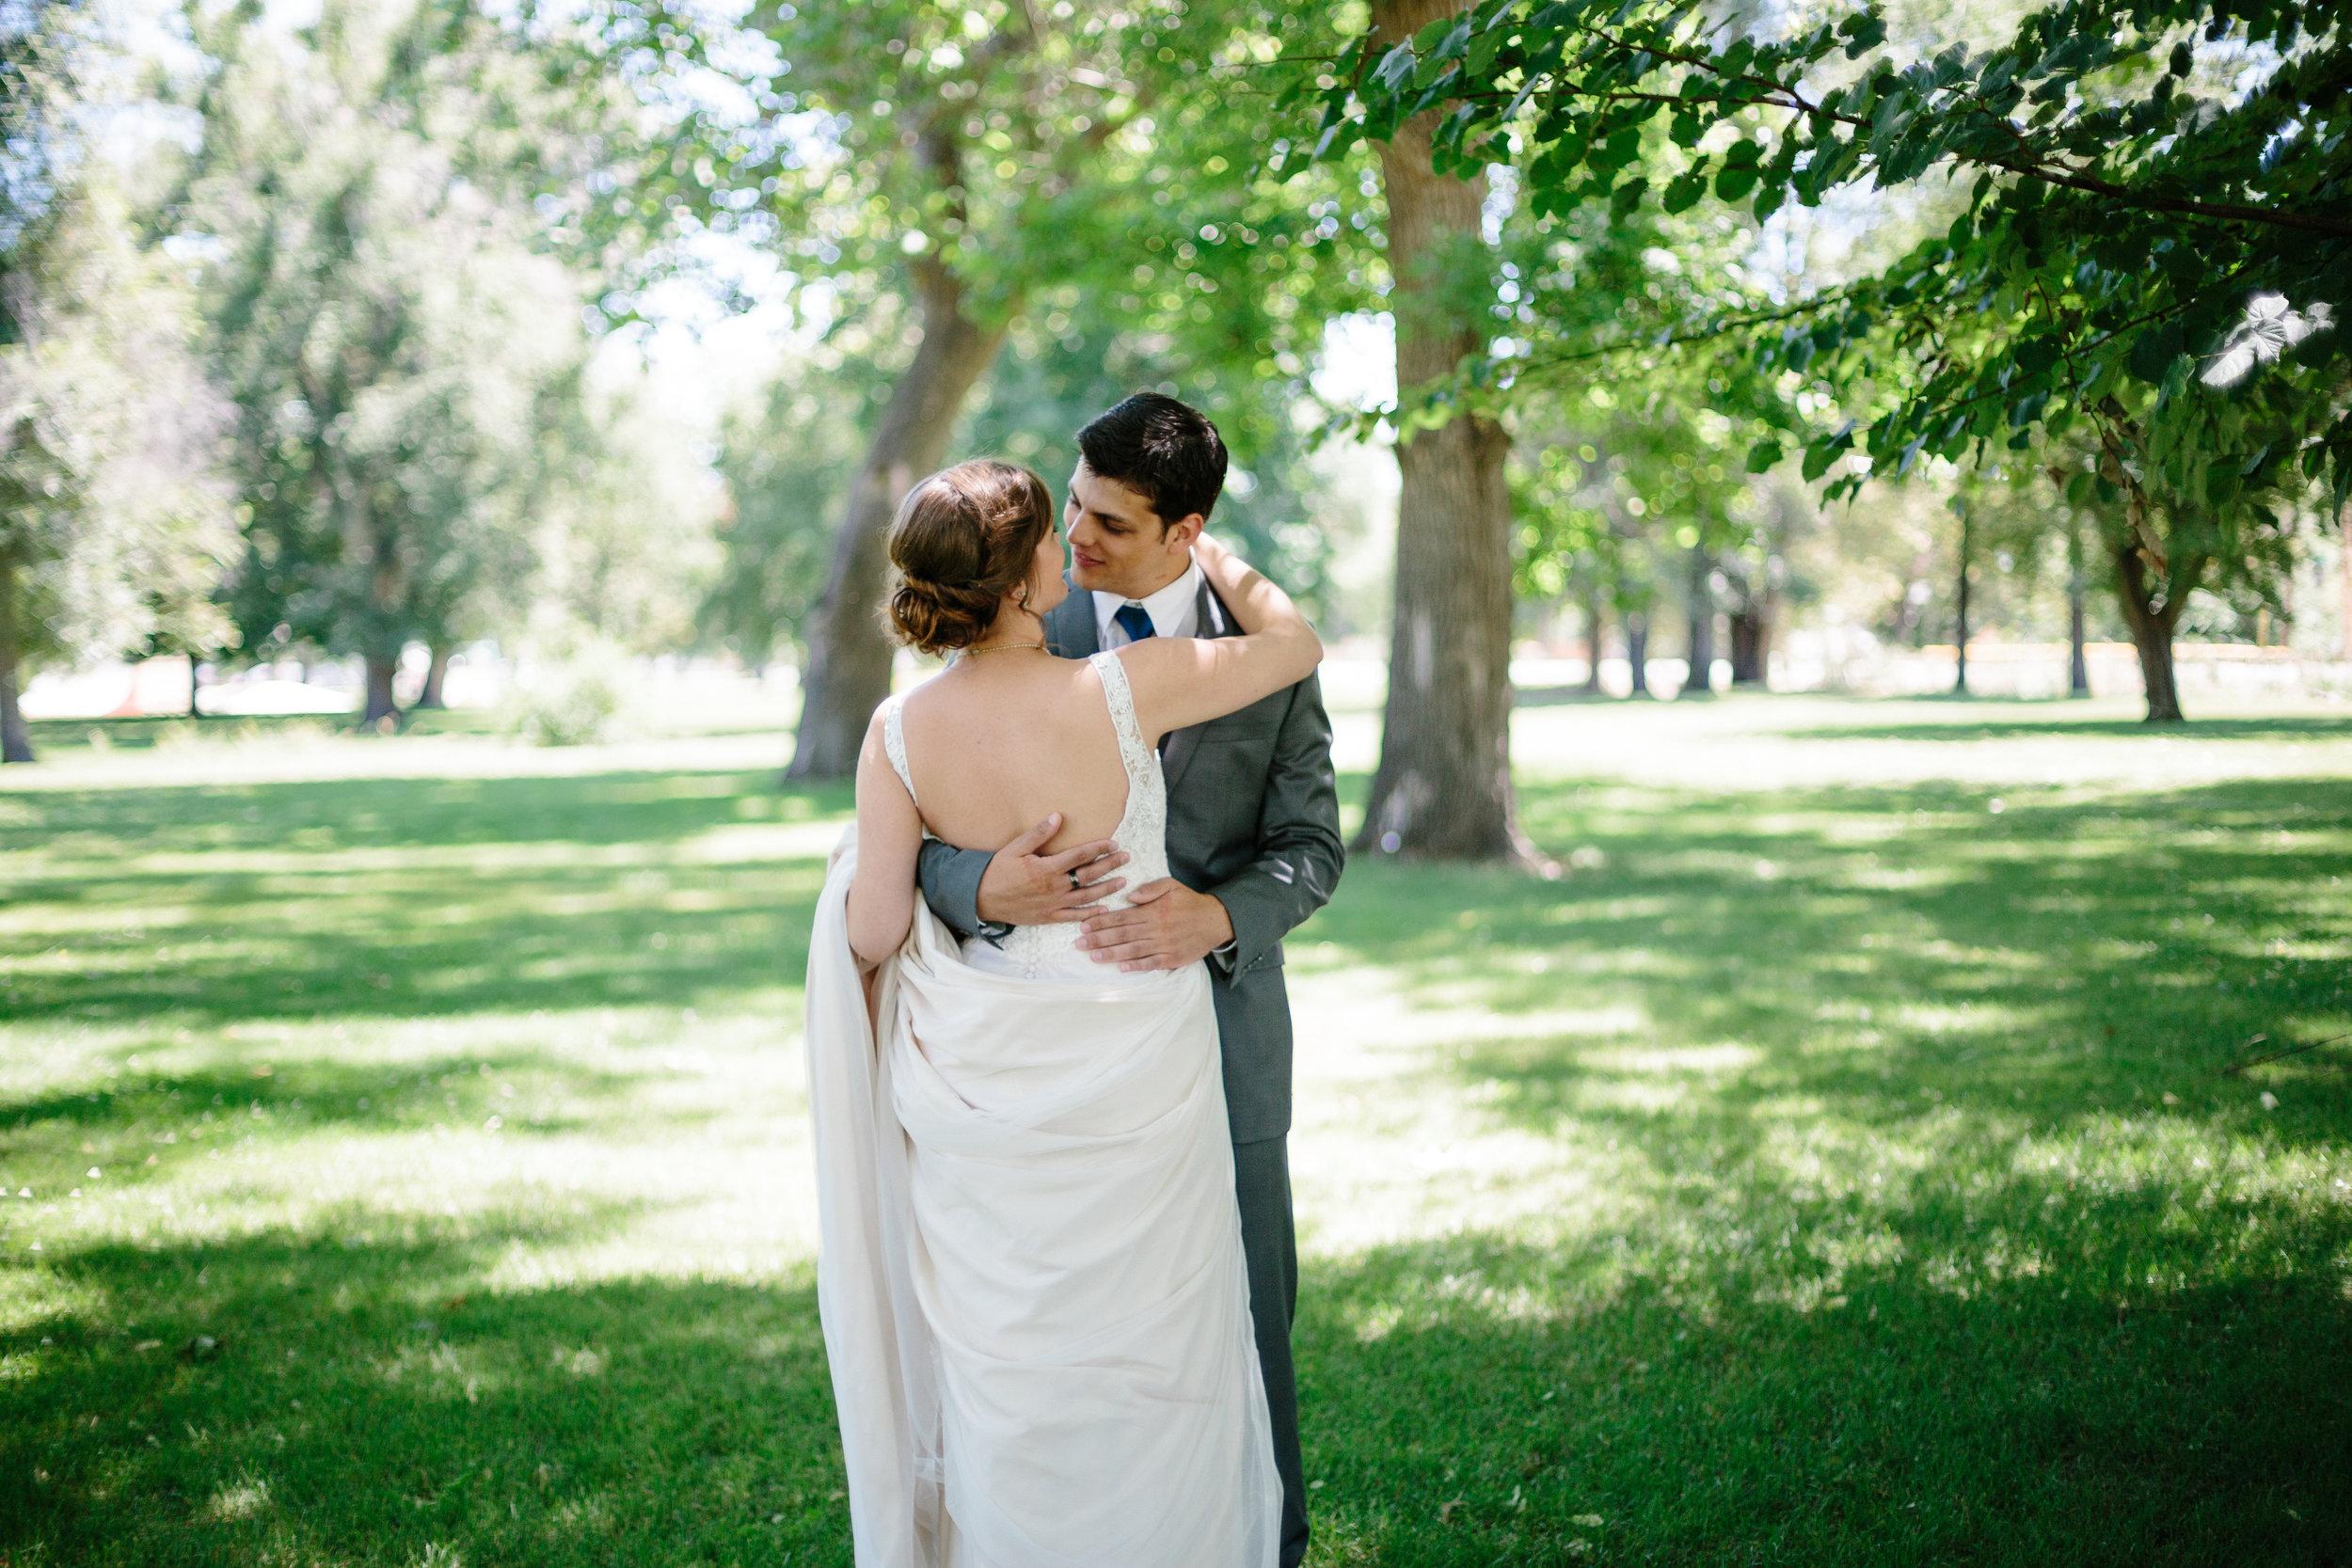 Jordan & Shantel Married - Idaho - Corrie Mick Photography-75.jpg